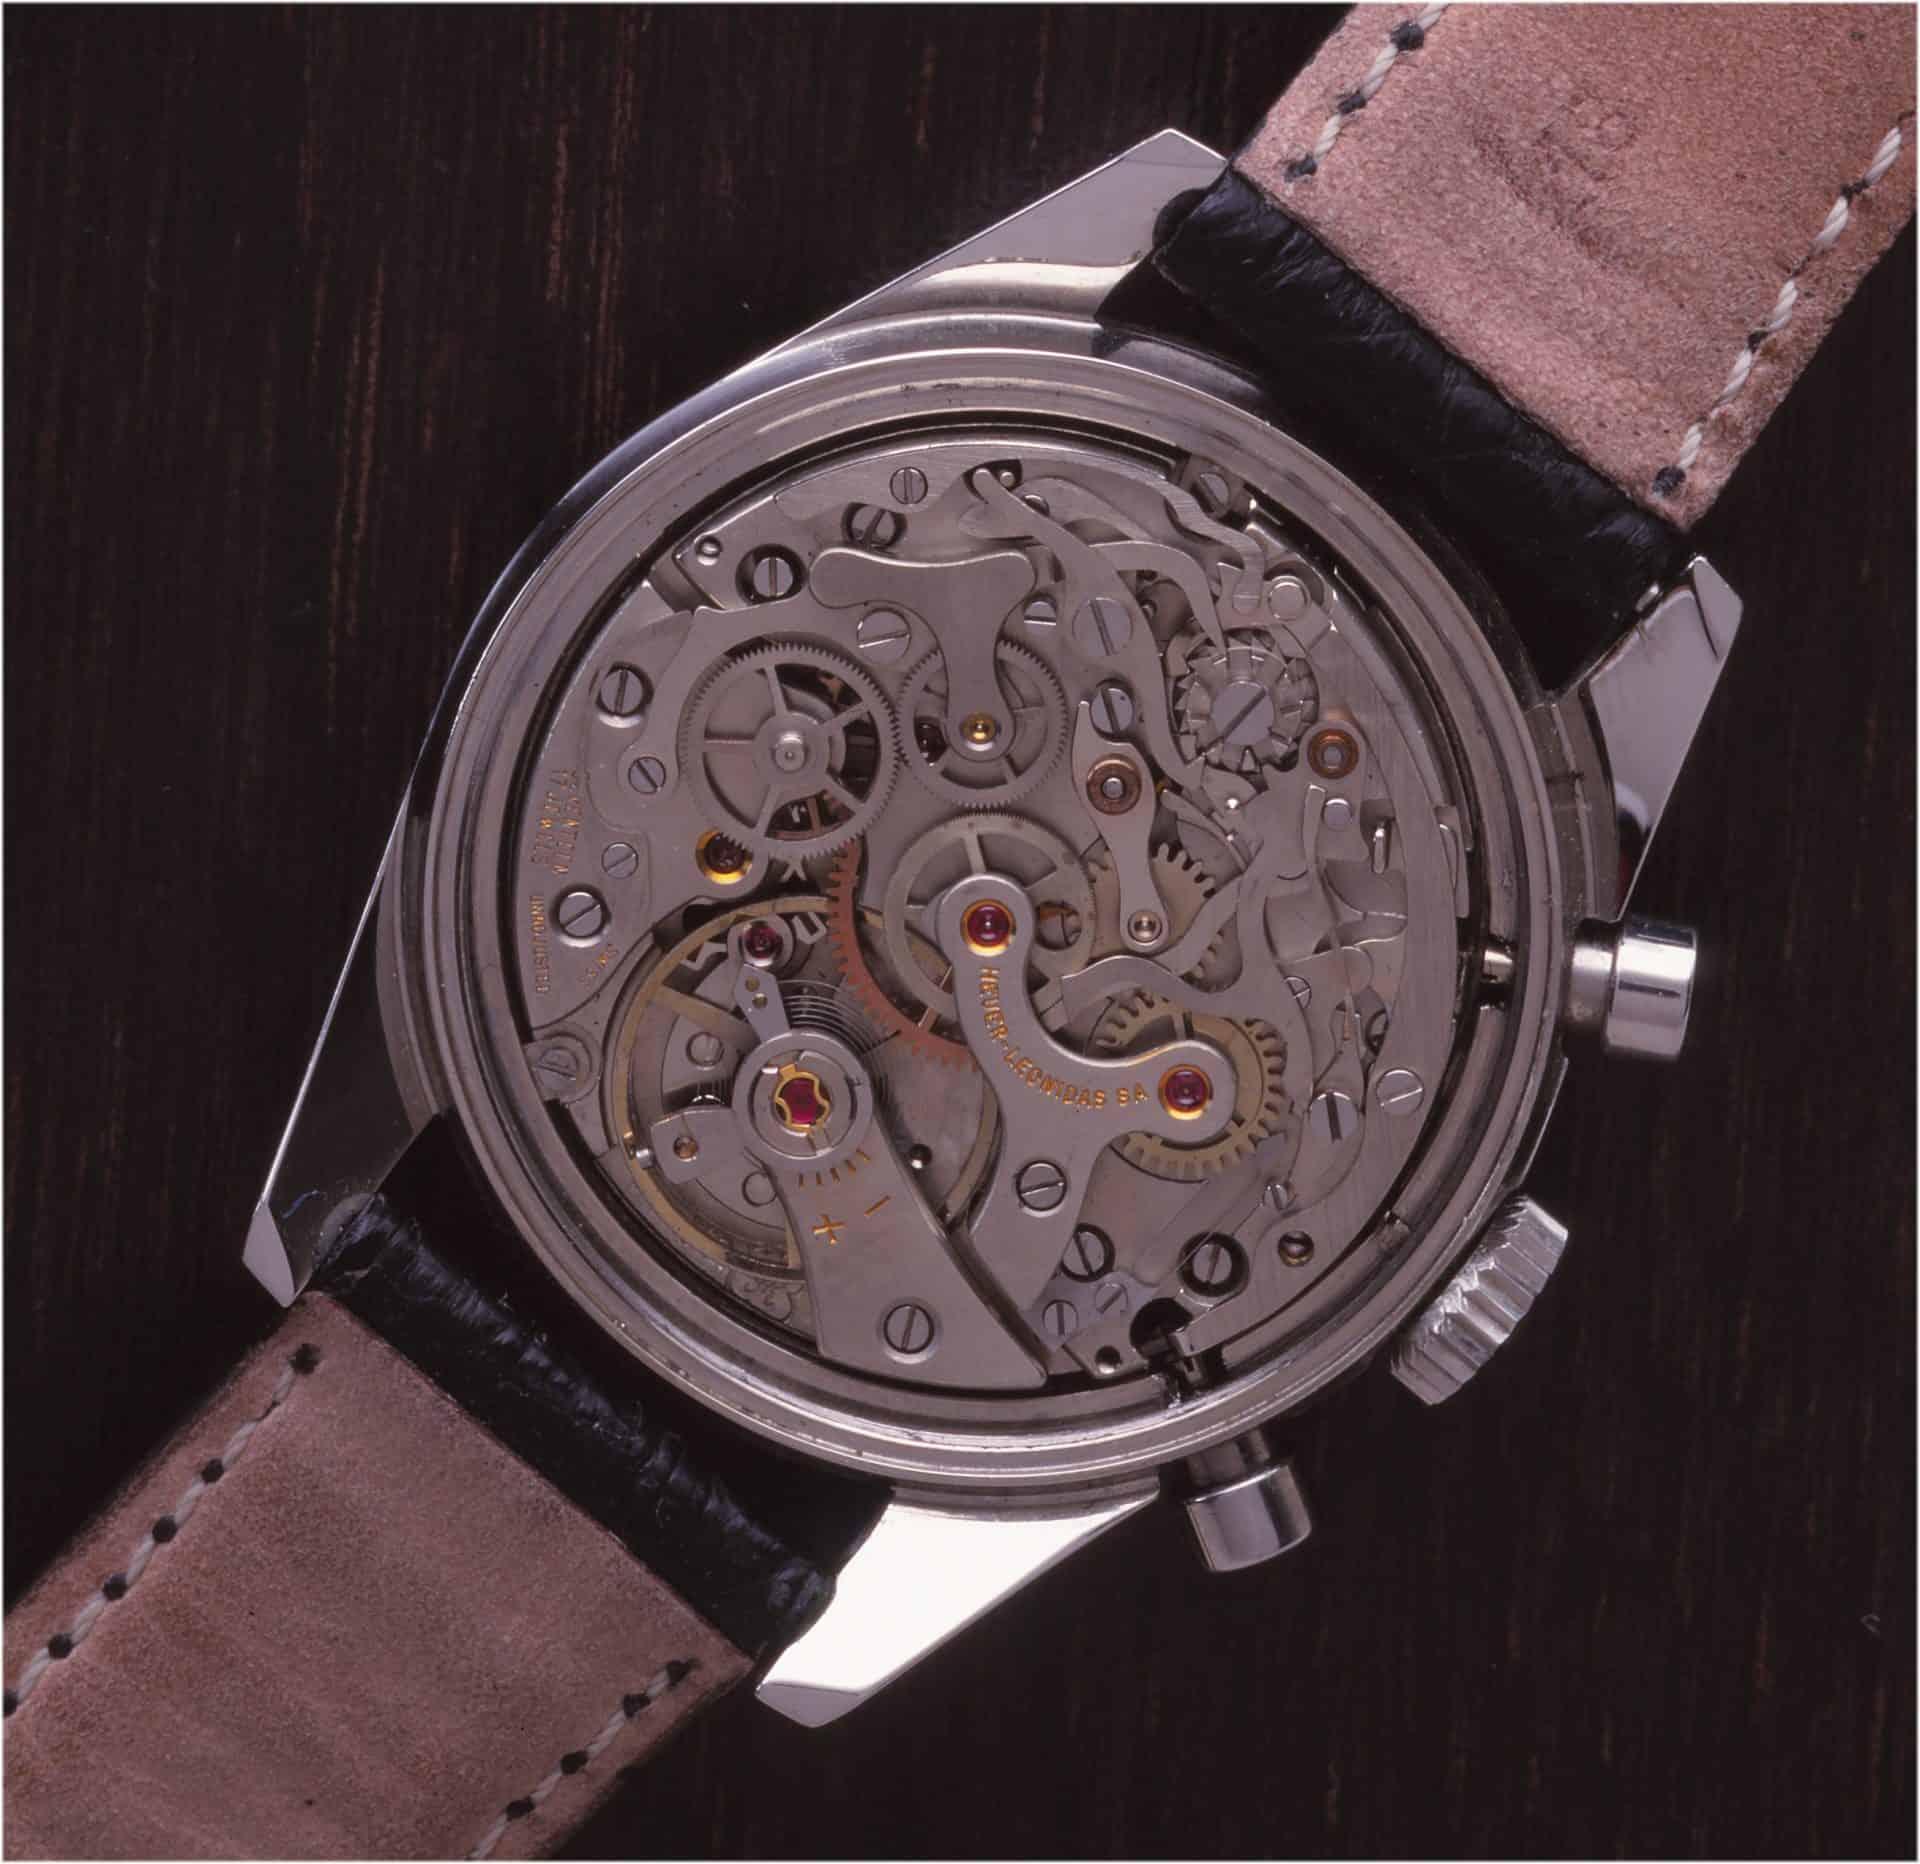 Heuer Carrera 12 Tachymeter Kaliber Valjoux 72 Uhrenkosmos